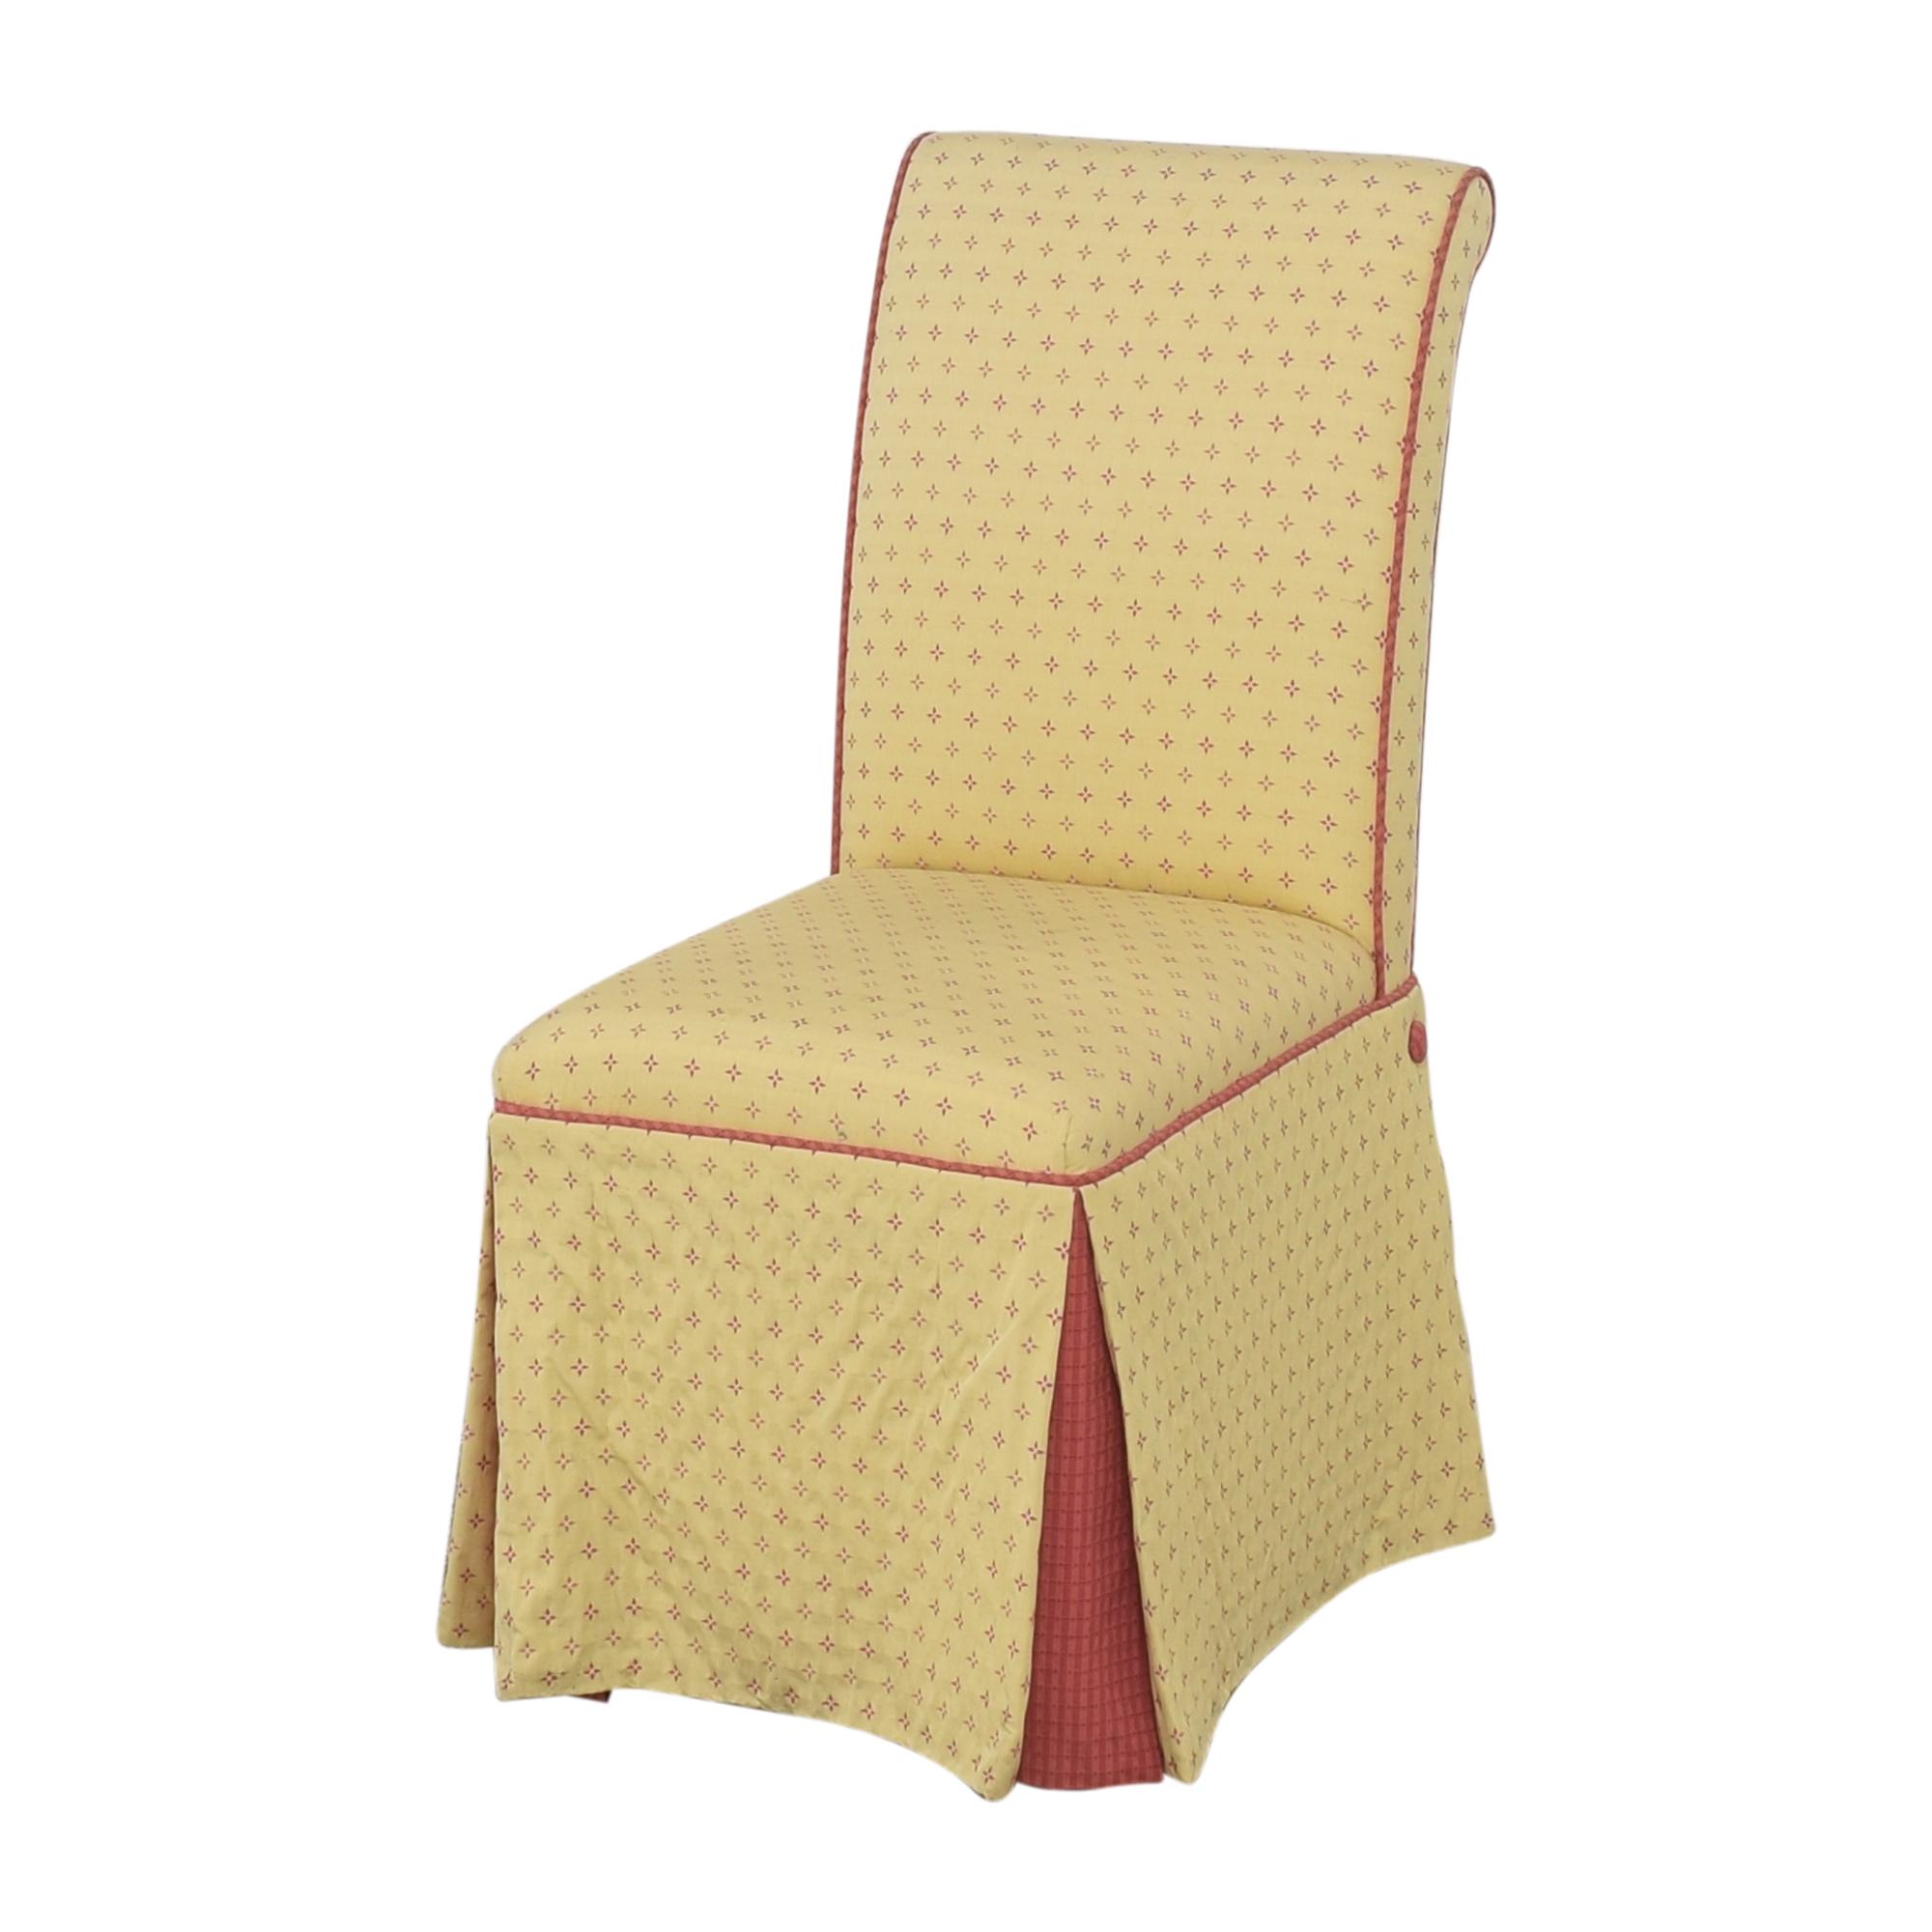 Custom Skirted Dining Chairs ma